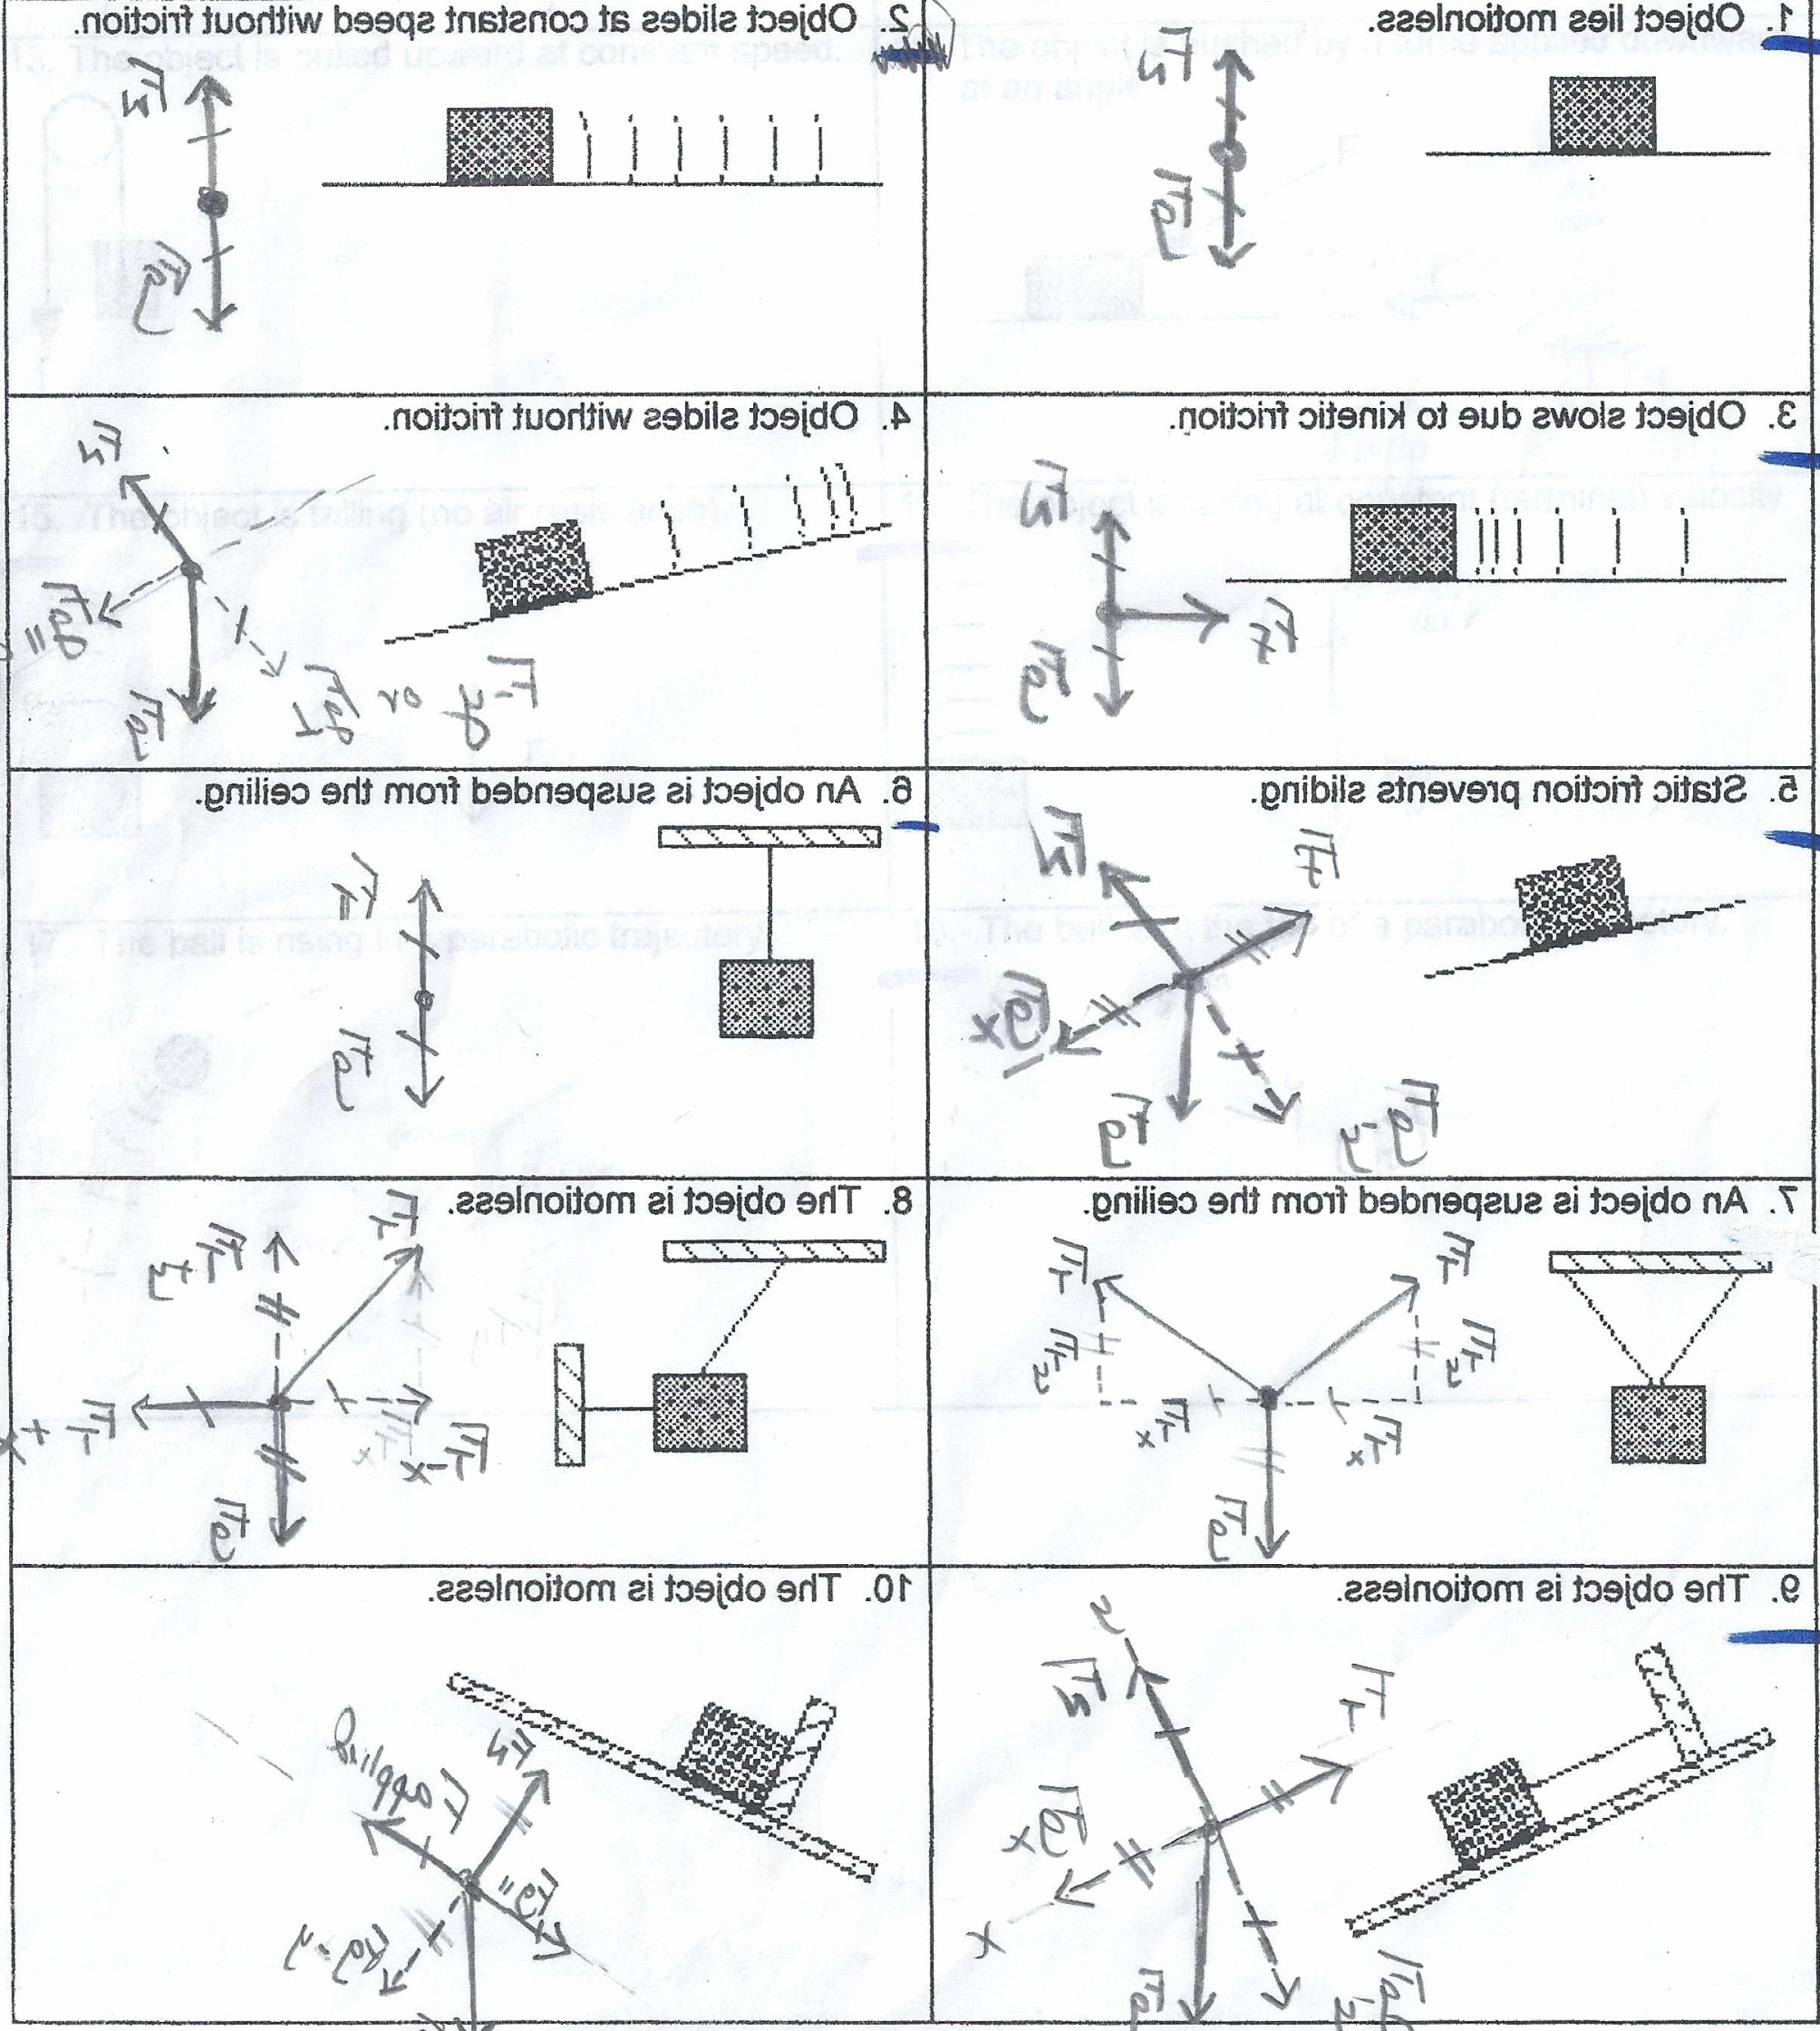 Dna Base Pairing Worksheet Answers Lovely Dna Base Pairing Worksheet Answer Key Worksheet Idea